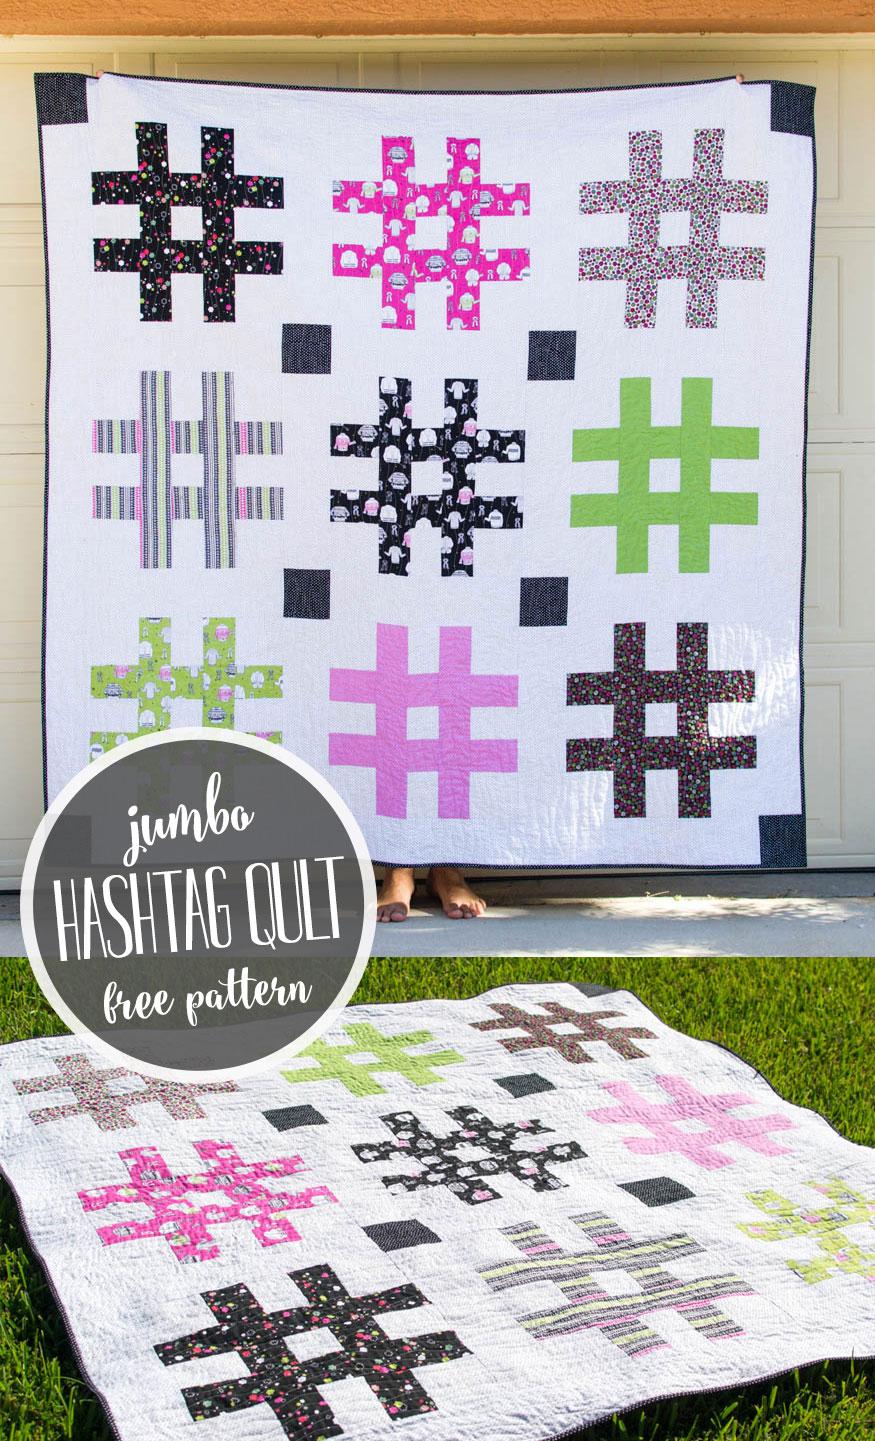 jumbo-hashtag-quilt-pattern-tall.jpg